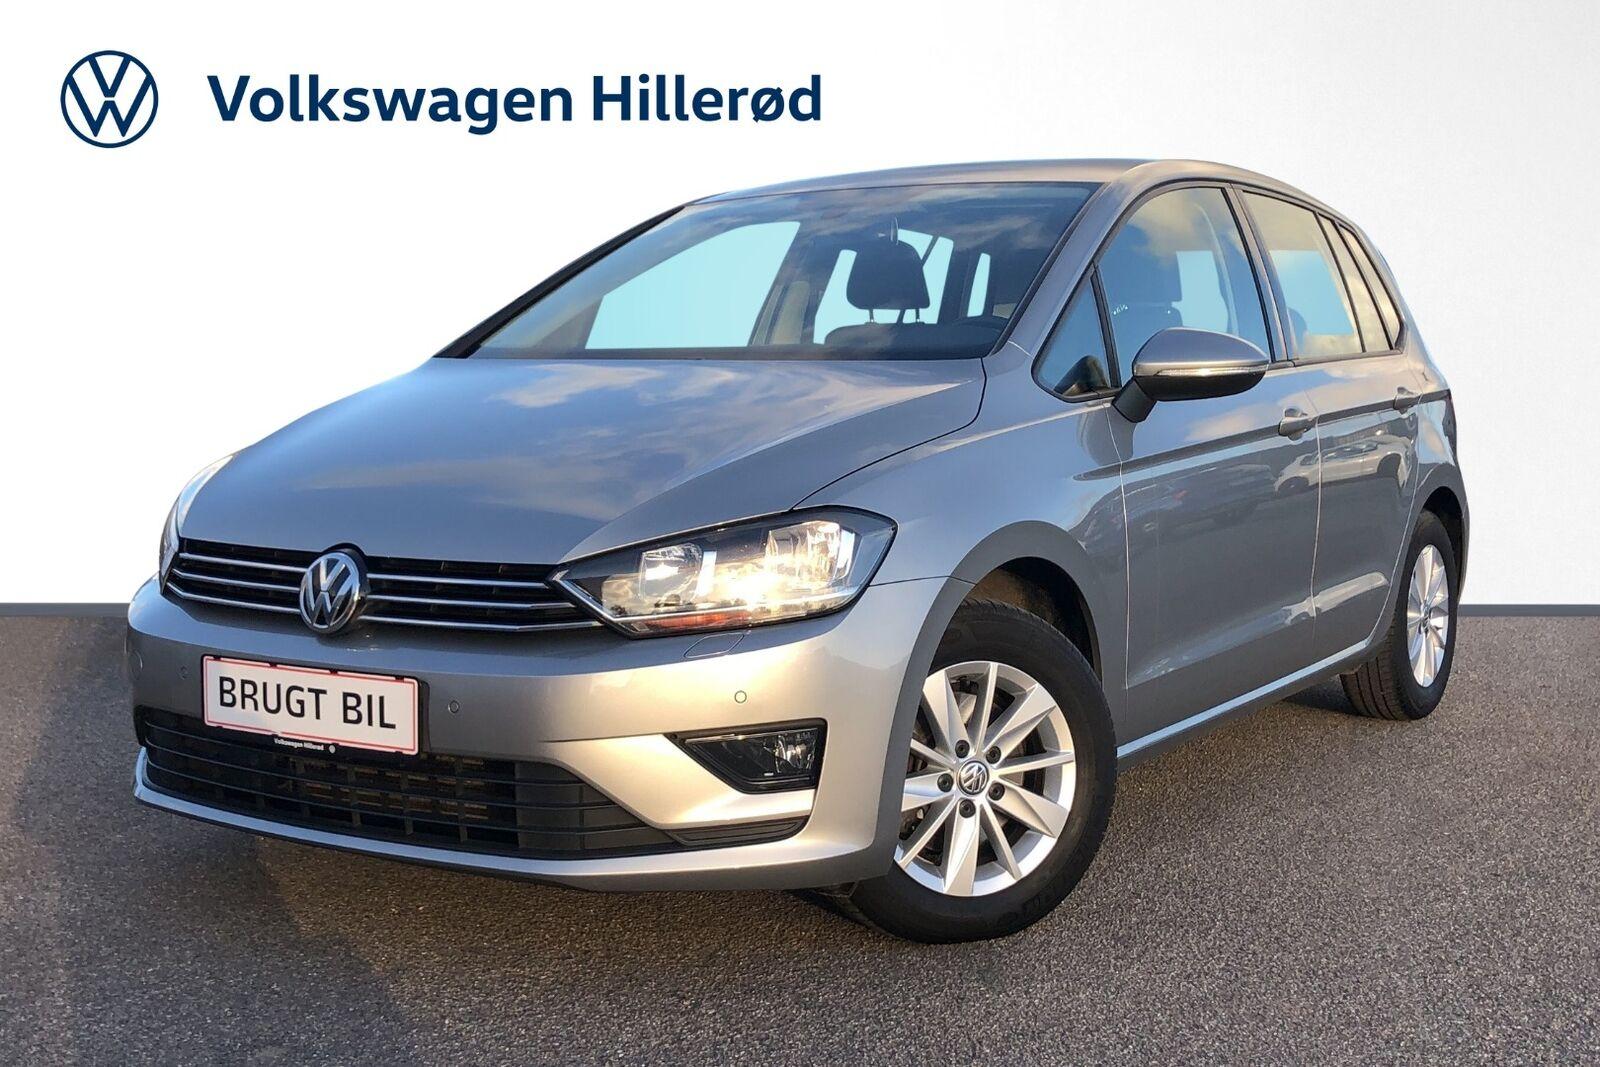 VW Golf Sportsvan 1,6 TDi 110 Comfortline DSG BMT 5d - 184.900 kr.